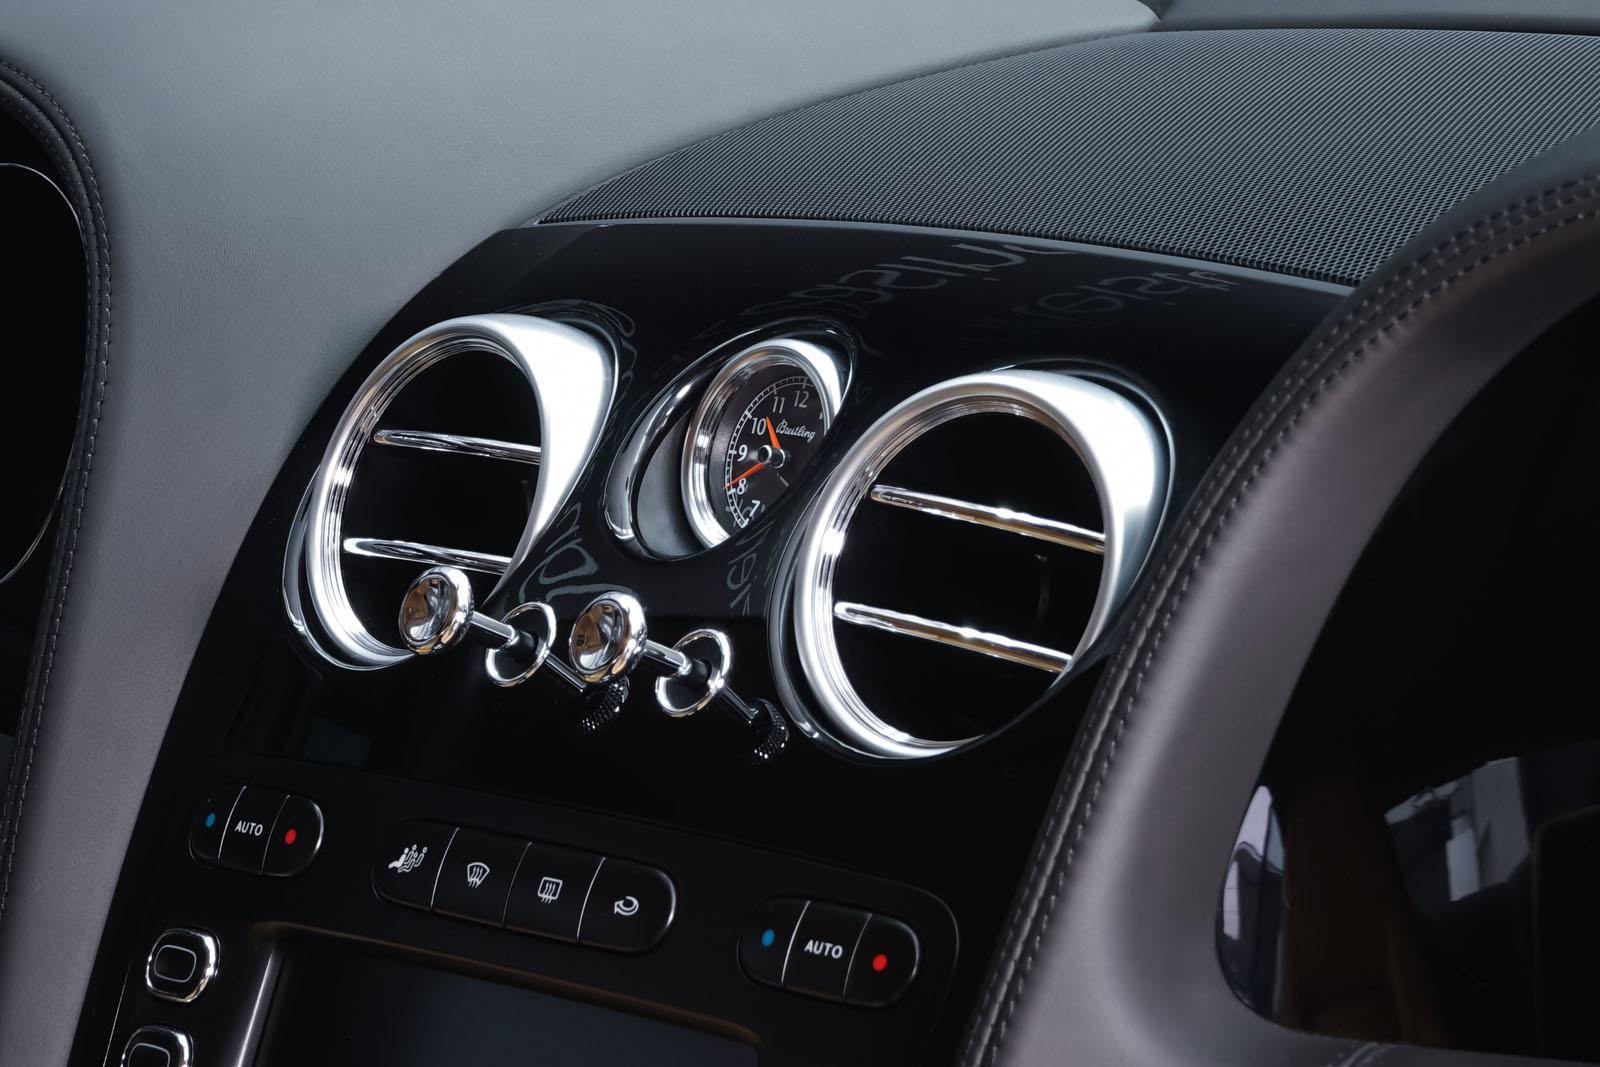 Bentley_Continental_GT_Schwarz_Beige_BEN-1159_18_w